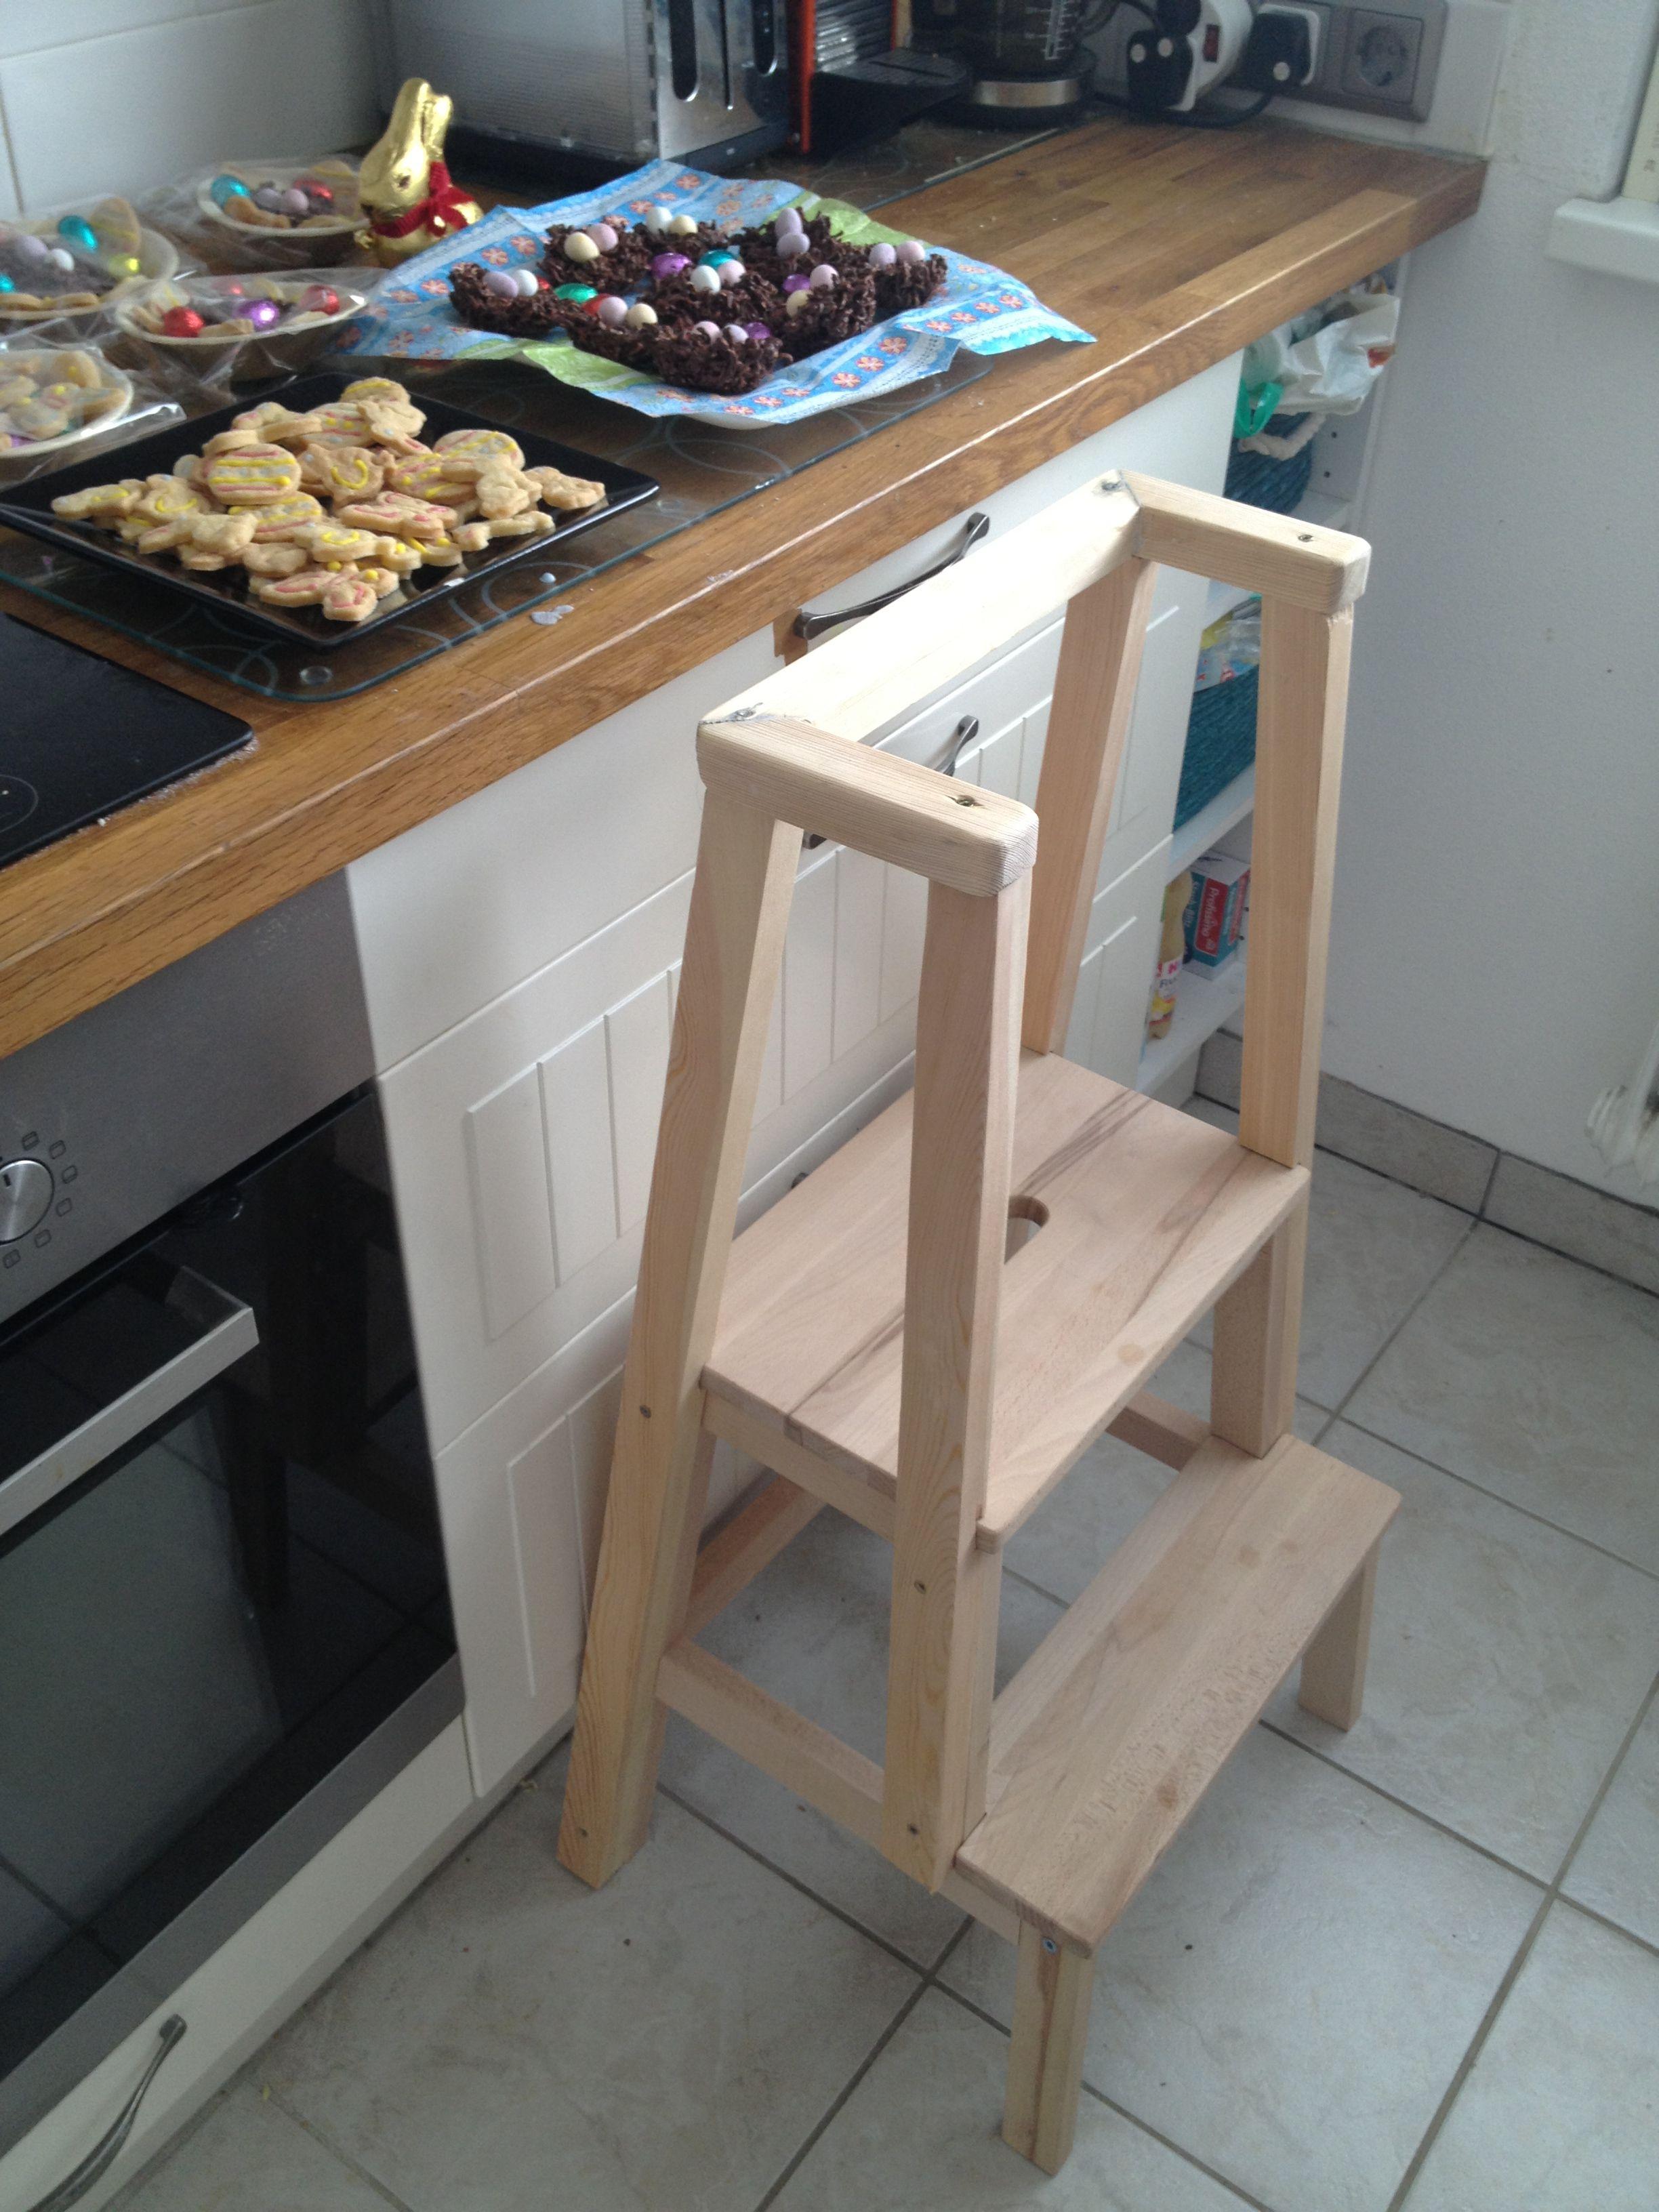 Toddler Work Top Stool Ikea Hack By My Dad Kids Furniture Ikea Stool Diy Furniture